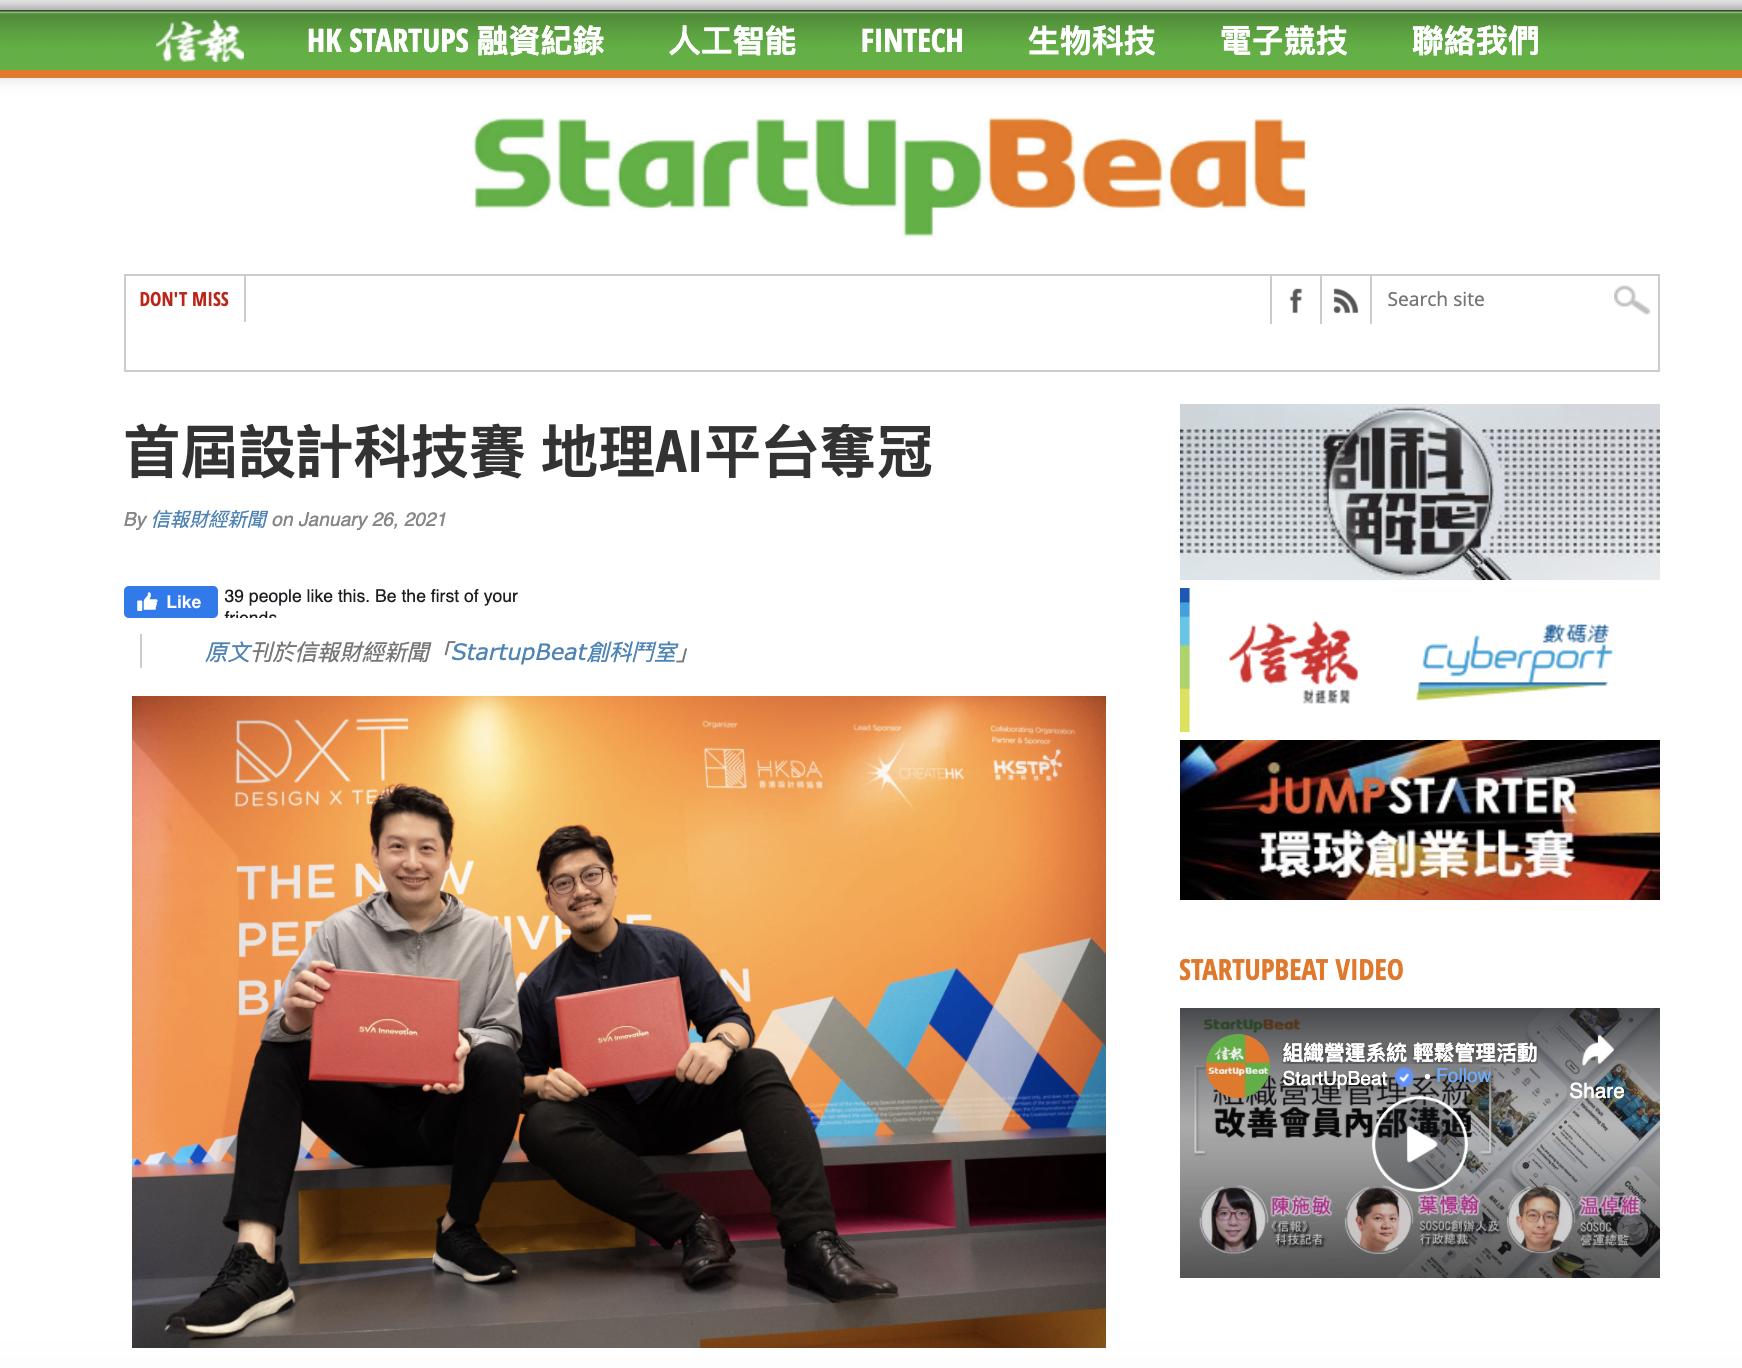 Startup beat